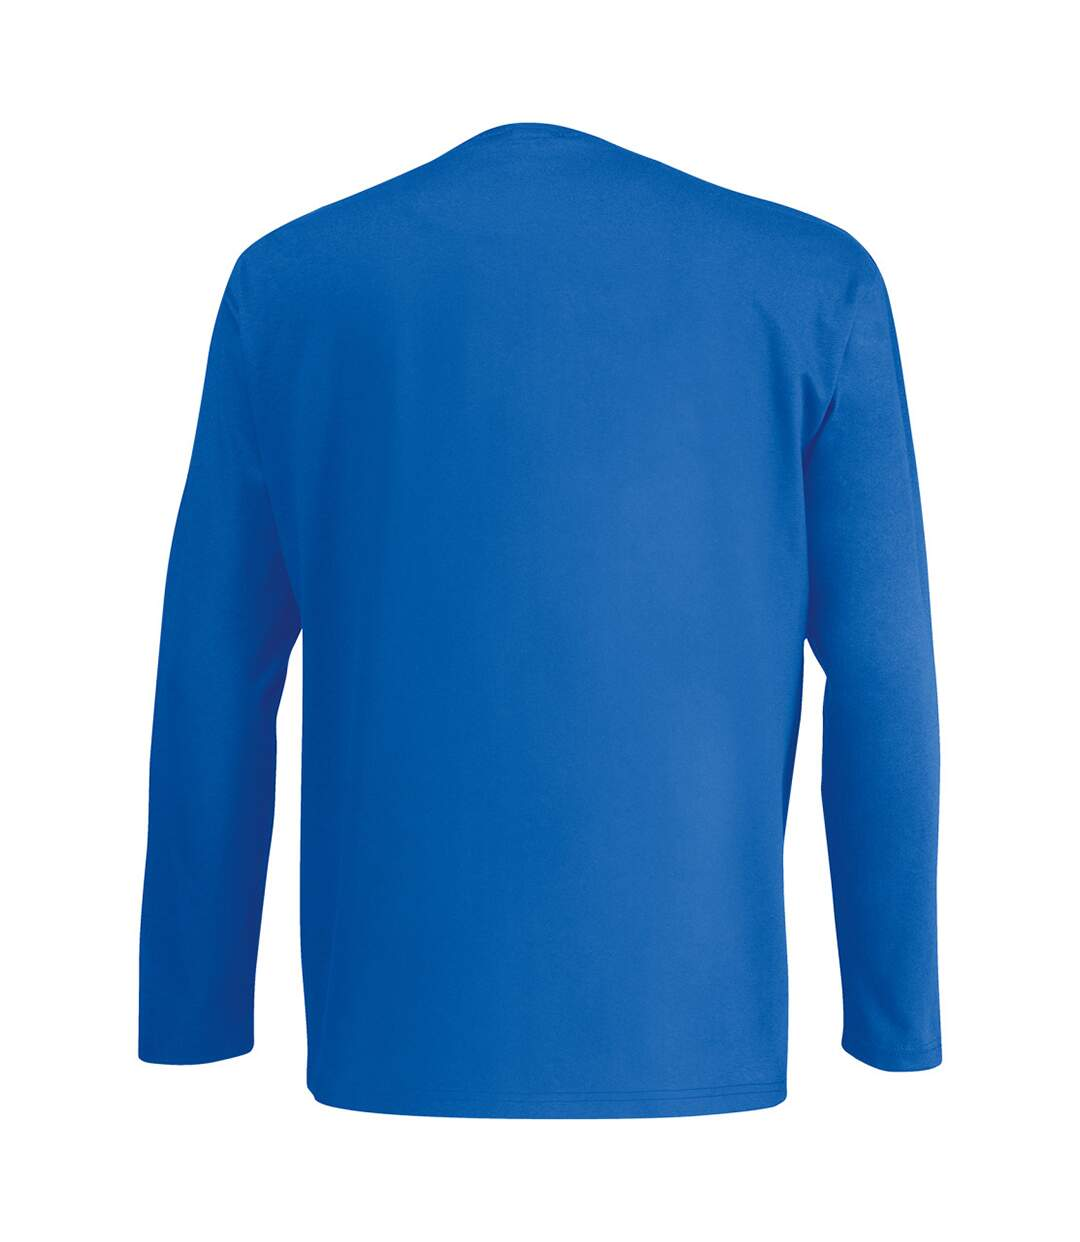 Mens Value Long Sleeve Casual T-Shirt (Cobalt) - UTBC3902